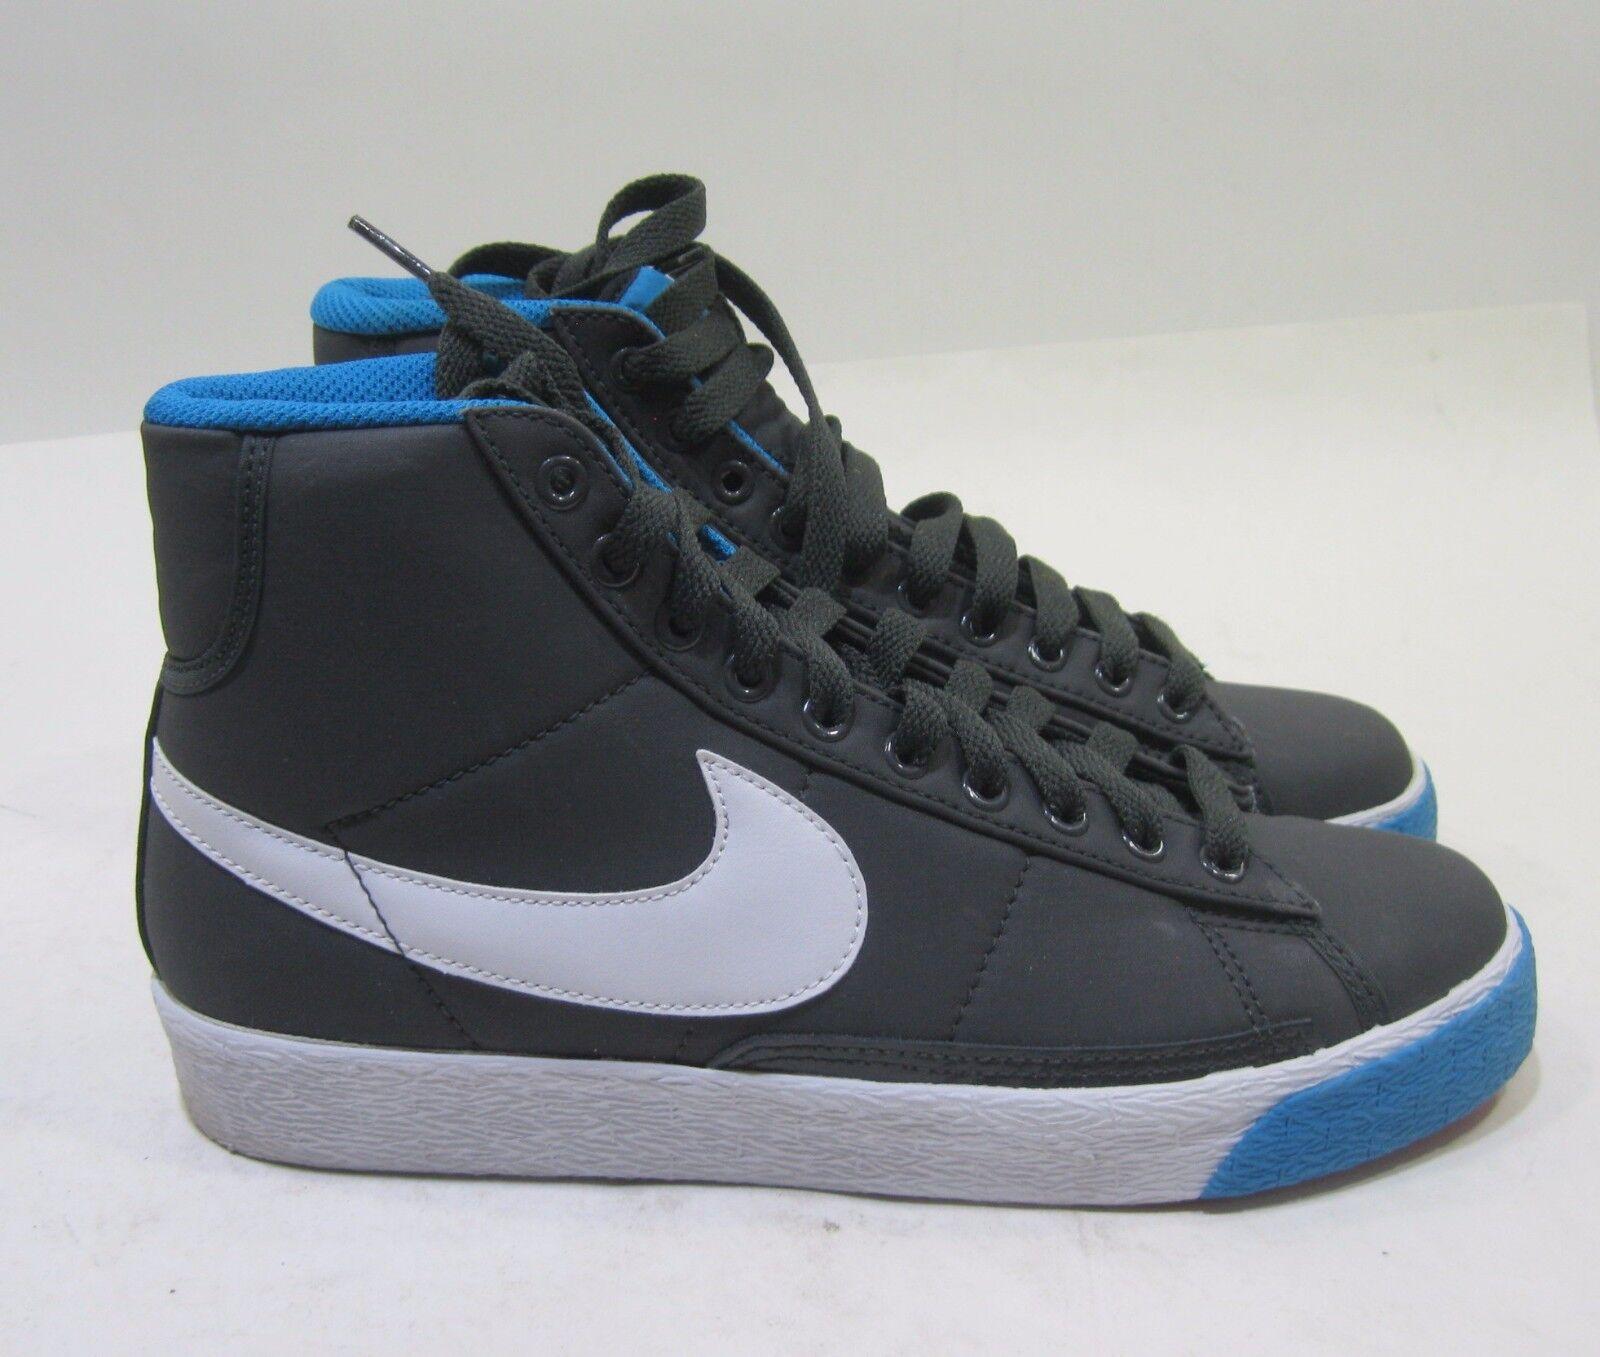 Nike Damenschuhe Blazer High Anthracite/WEISS-Blau Liquor-ROT 317808-016 Größe 8